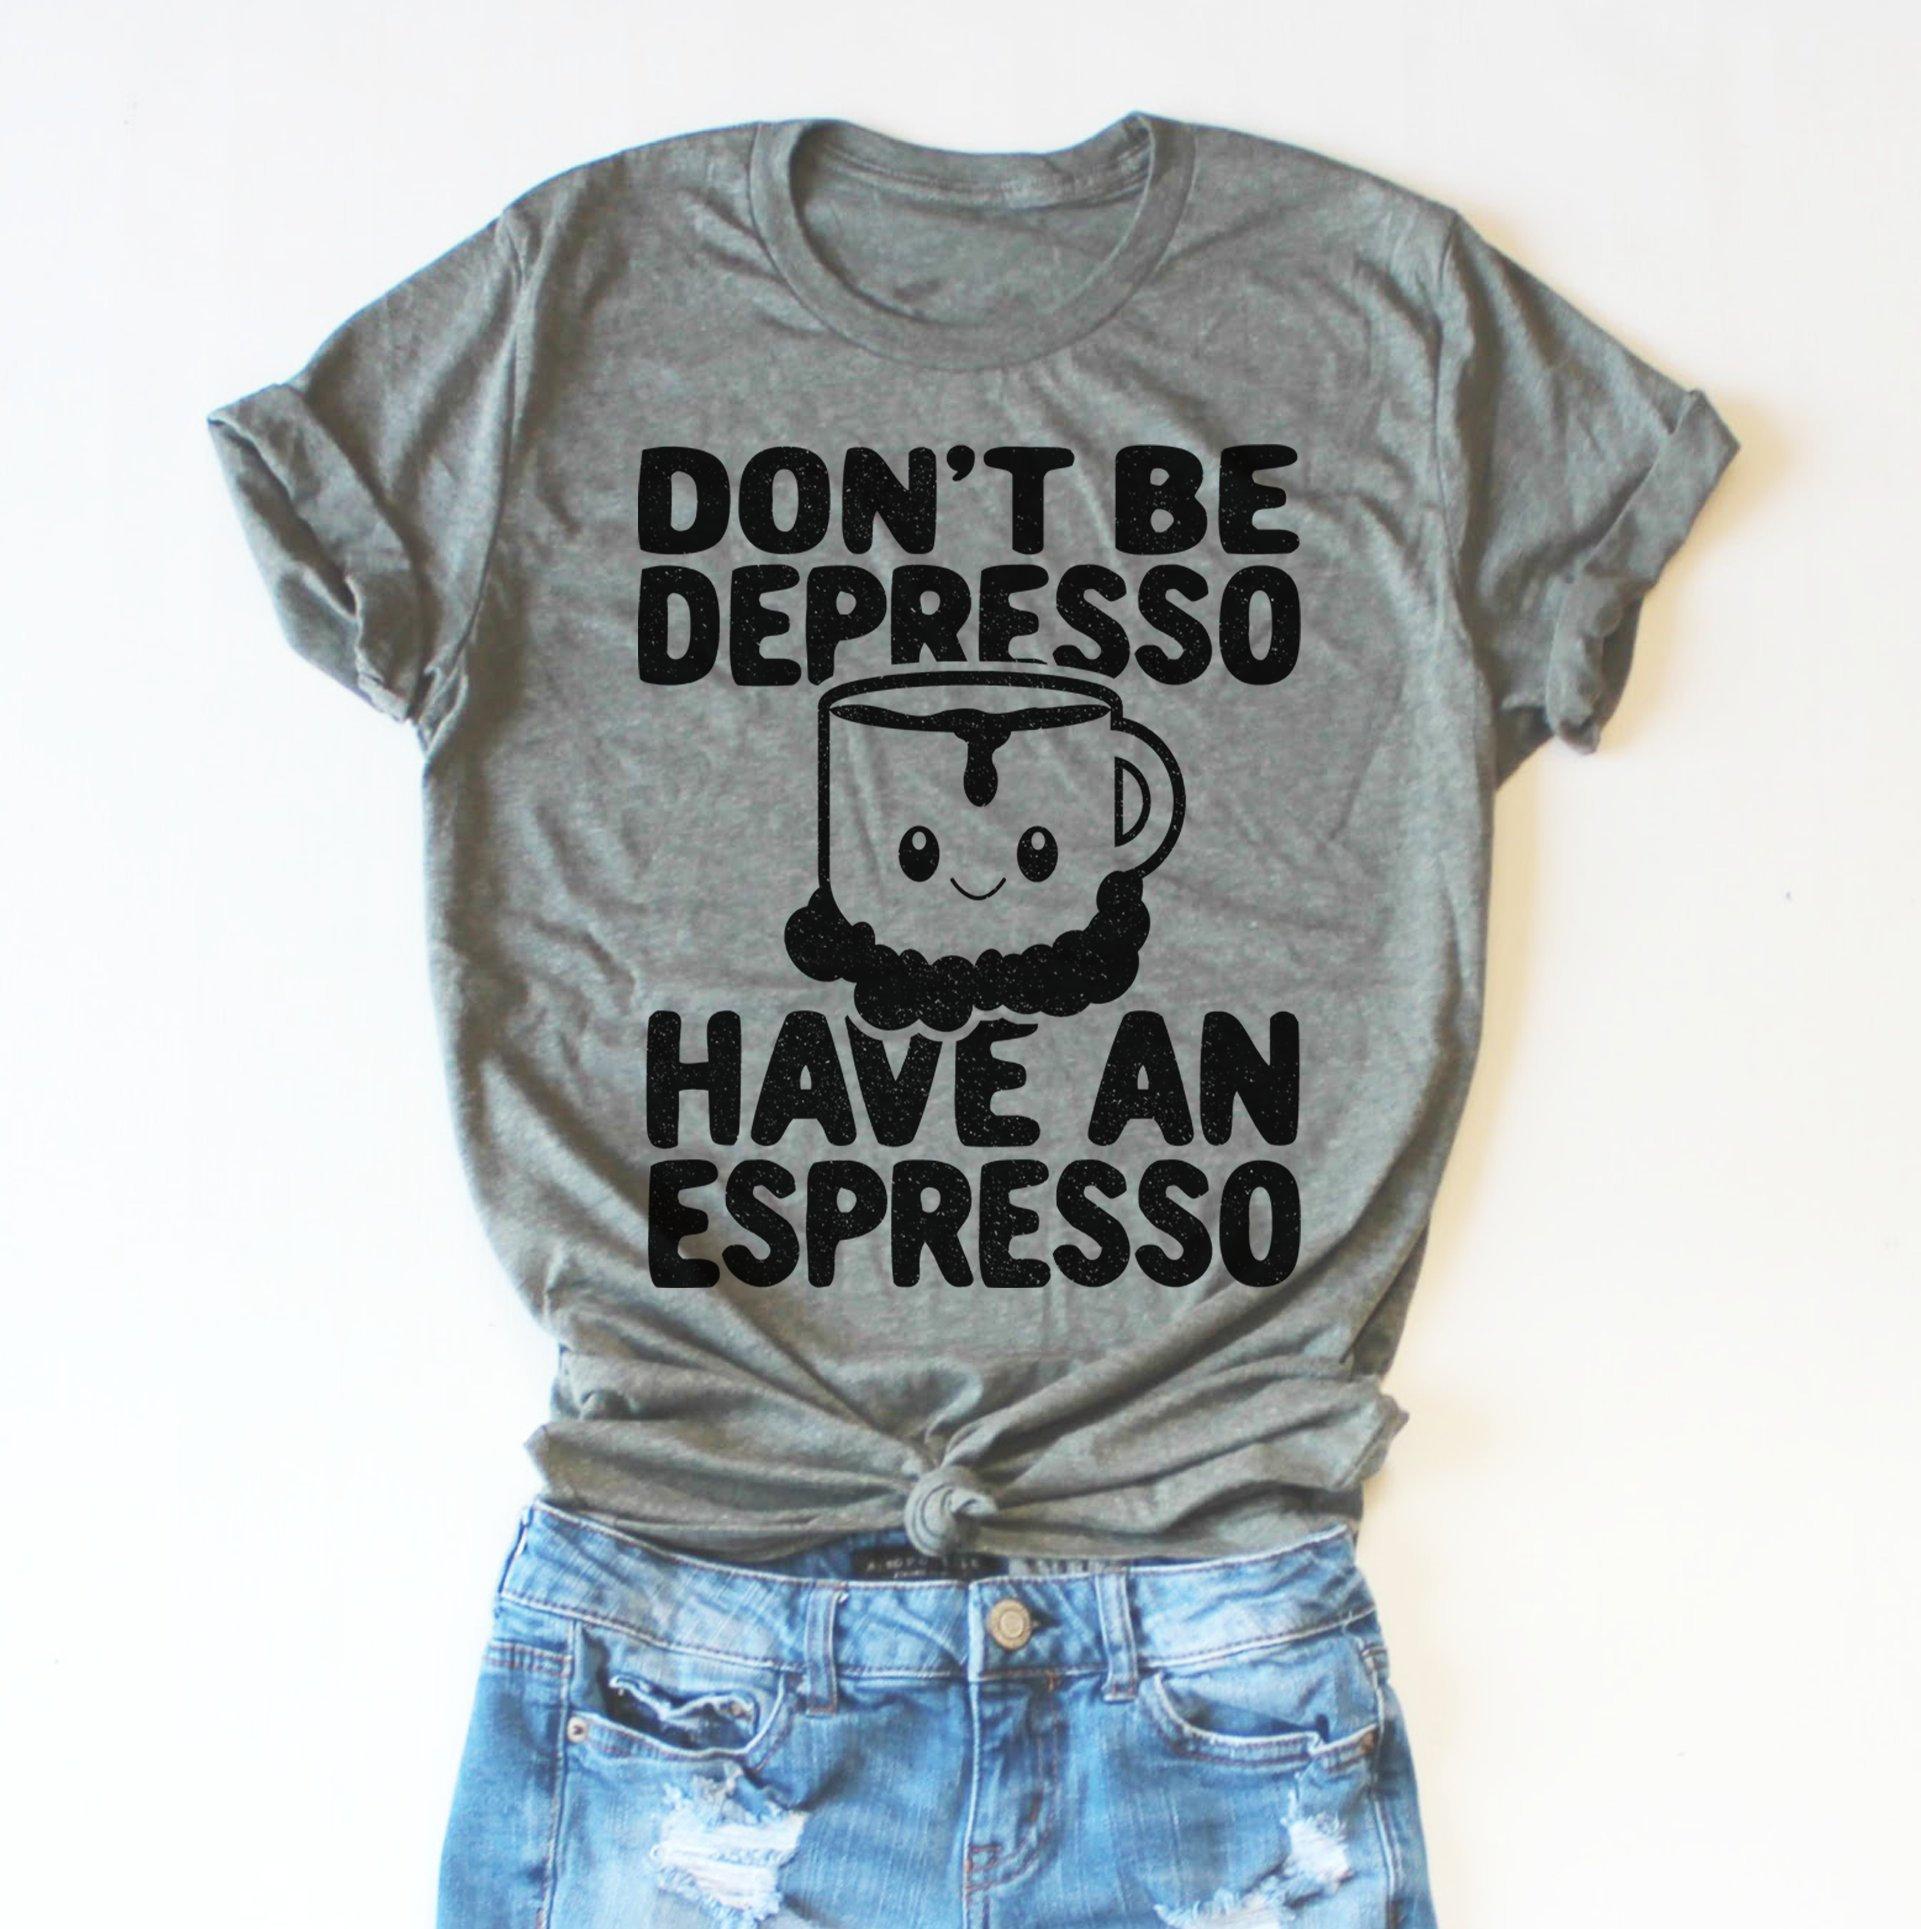 il_fullxfull.1779724003_hhgv.jpg #coffeeLovers